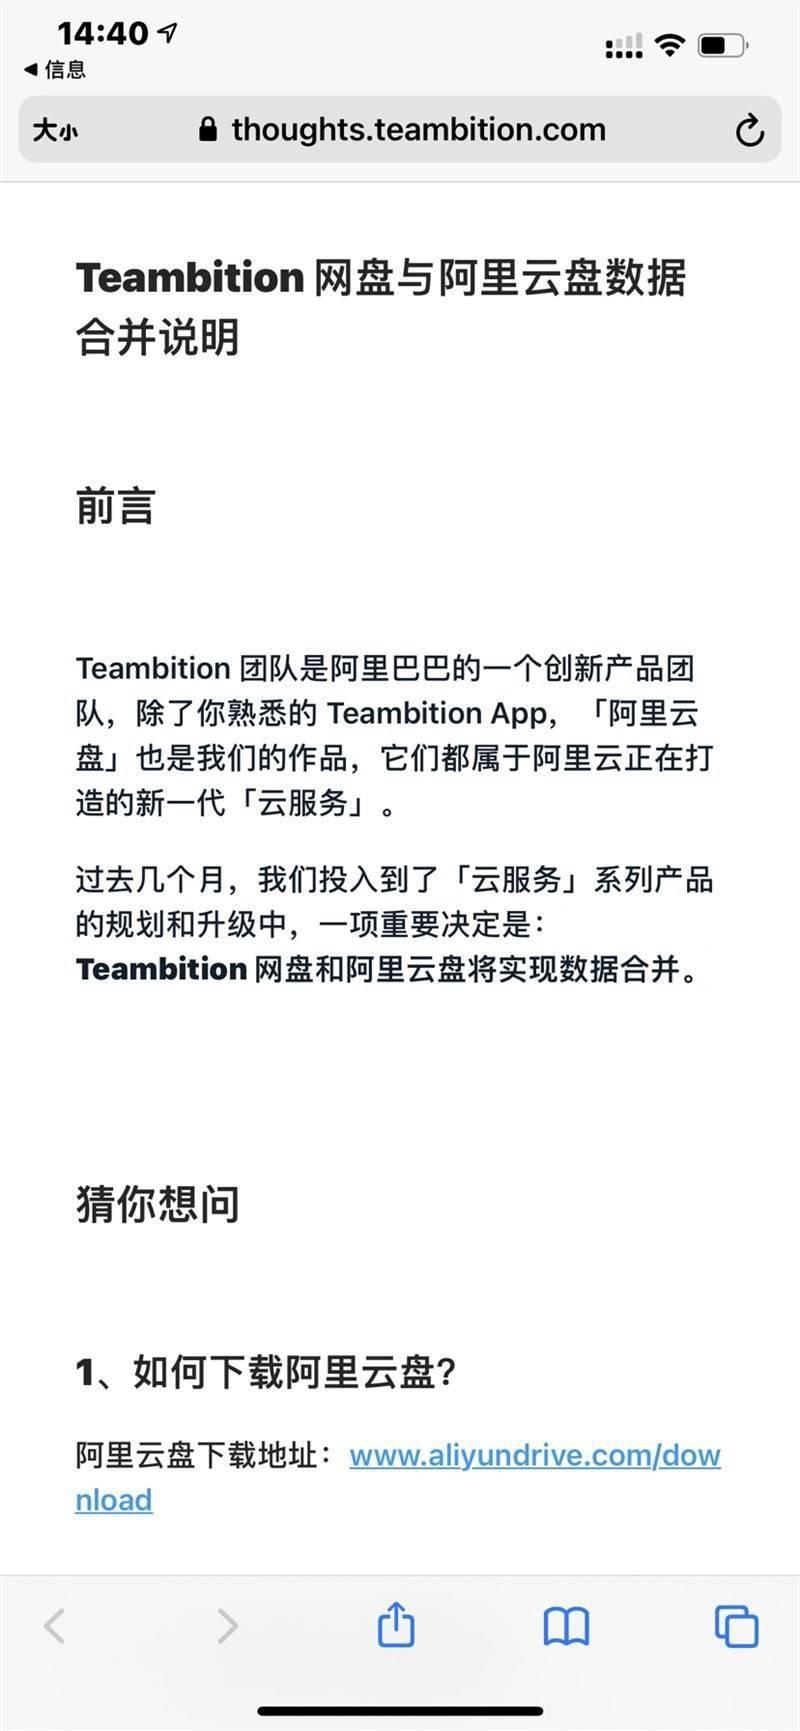 Tea飞猫网盘资源mbition 网盘和阿里云盘宣布将数-奇享网